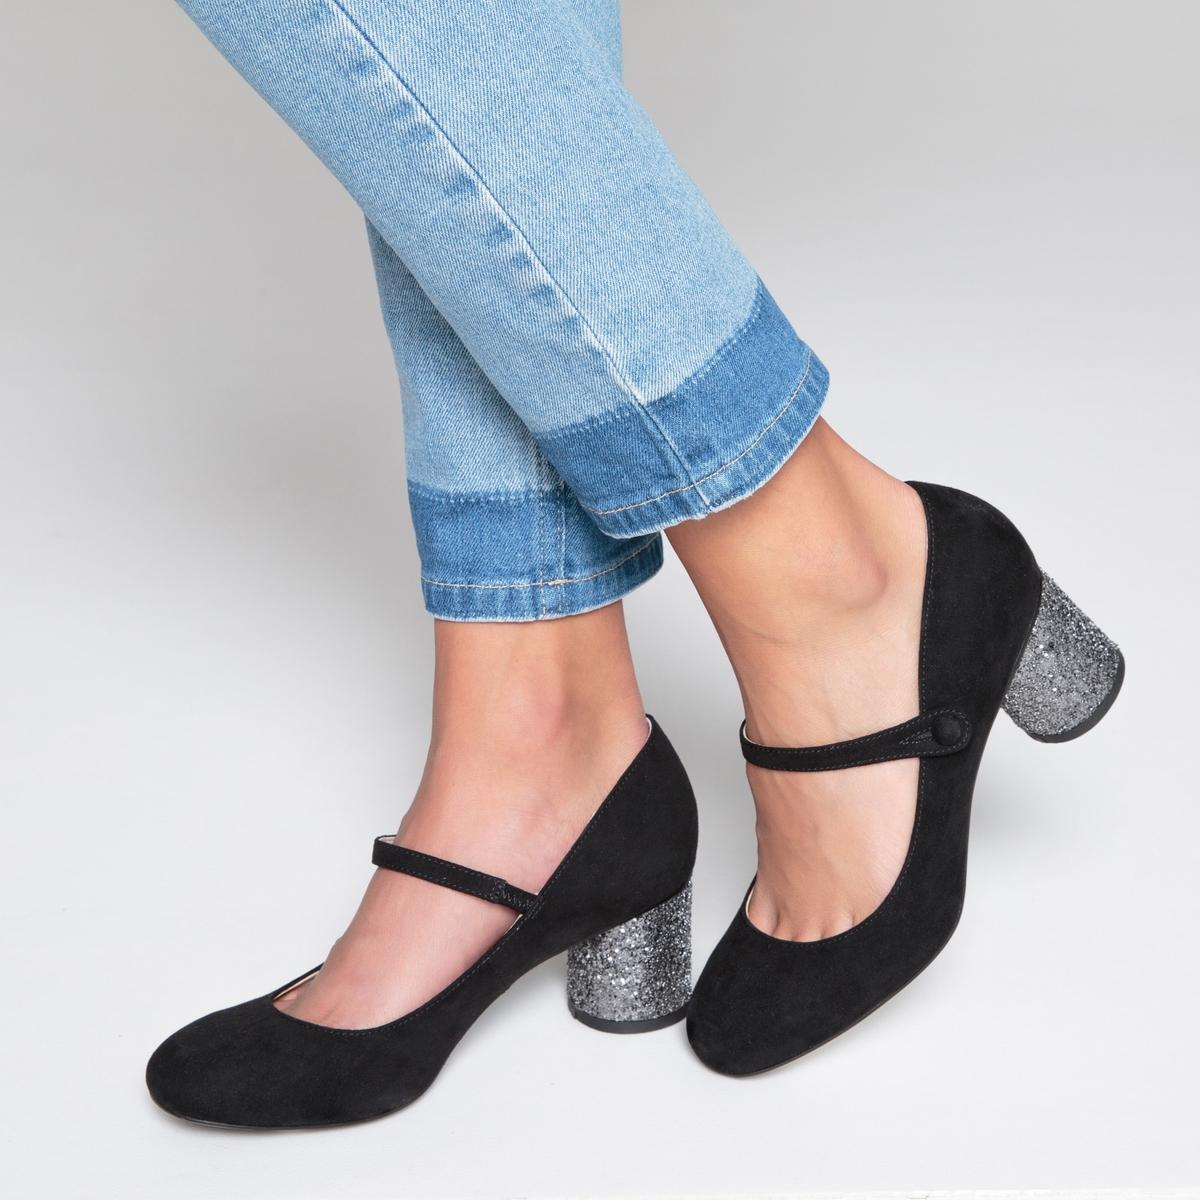 Балетки на каблуке с пайетками